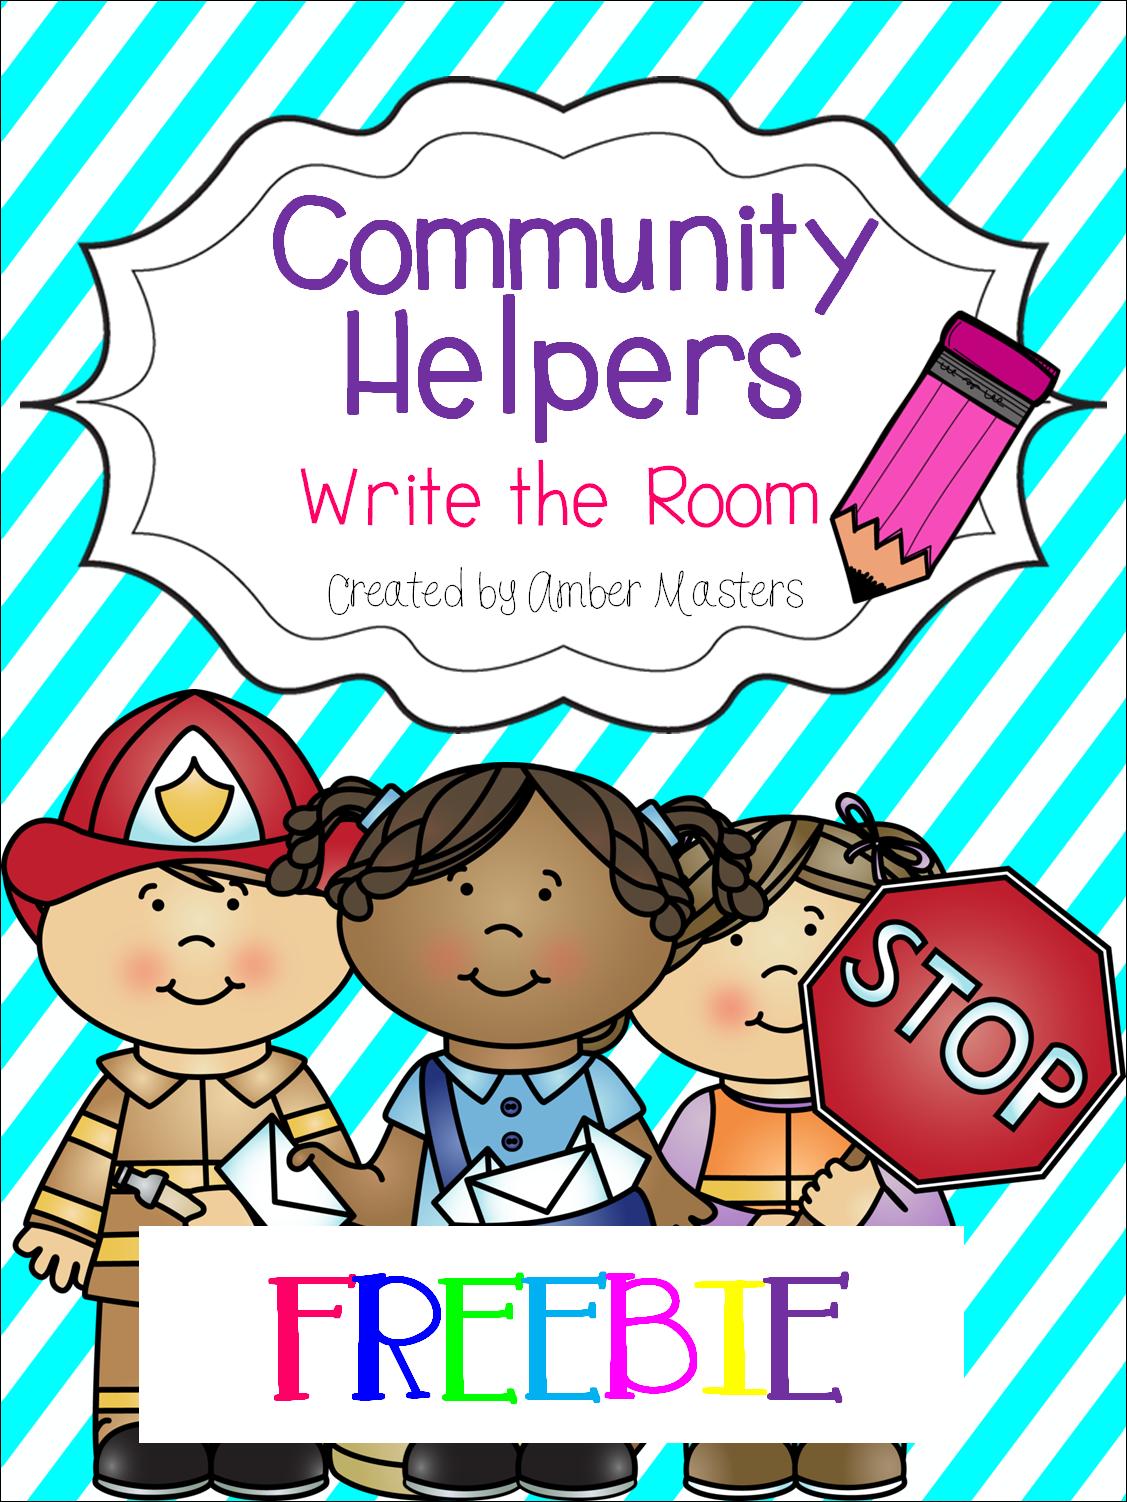 https://www.dropbox.com/s/6whp6iou0r3jqiz/community%20helpers%20freebie%20pdf.pdf?dl=0